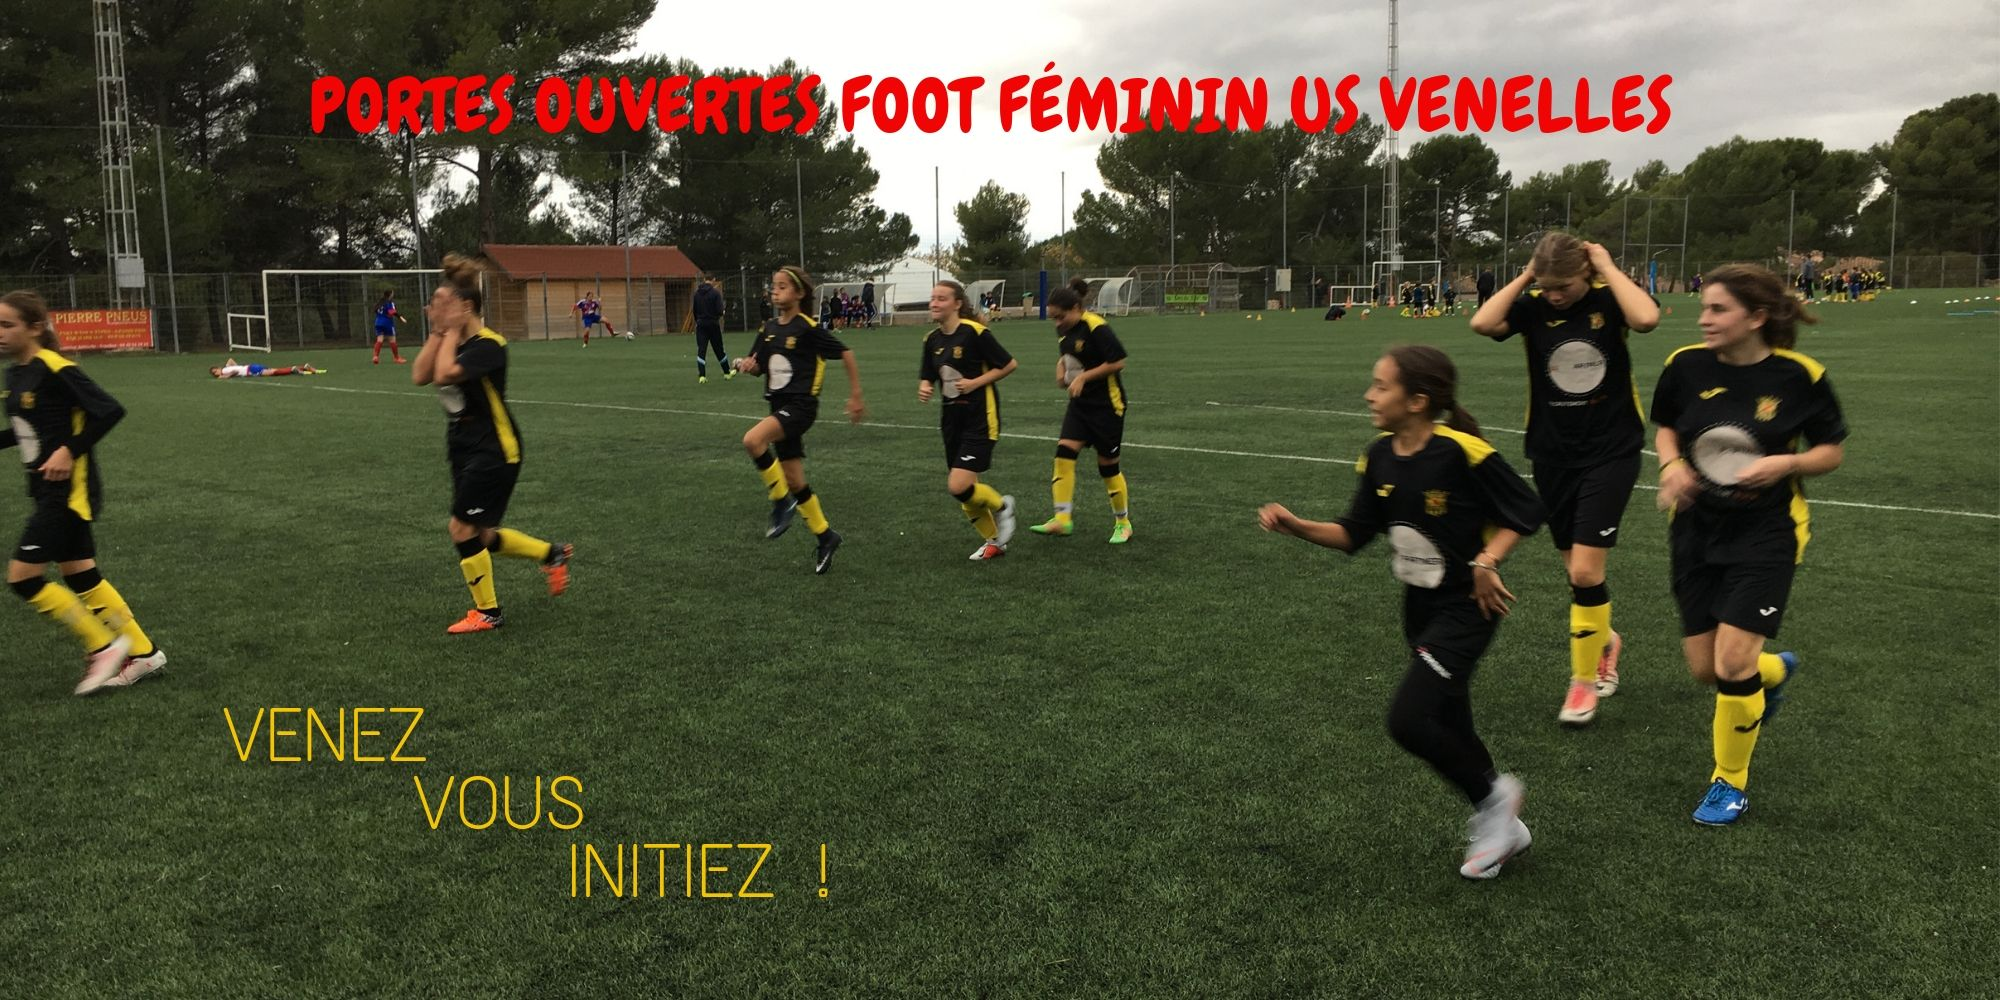 Portes ouvertes Foot féminin - USV